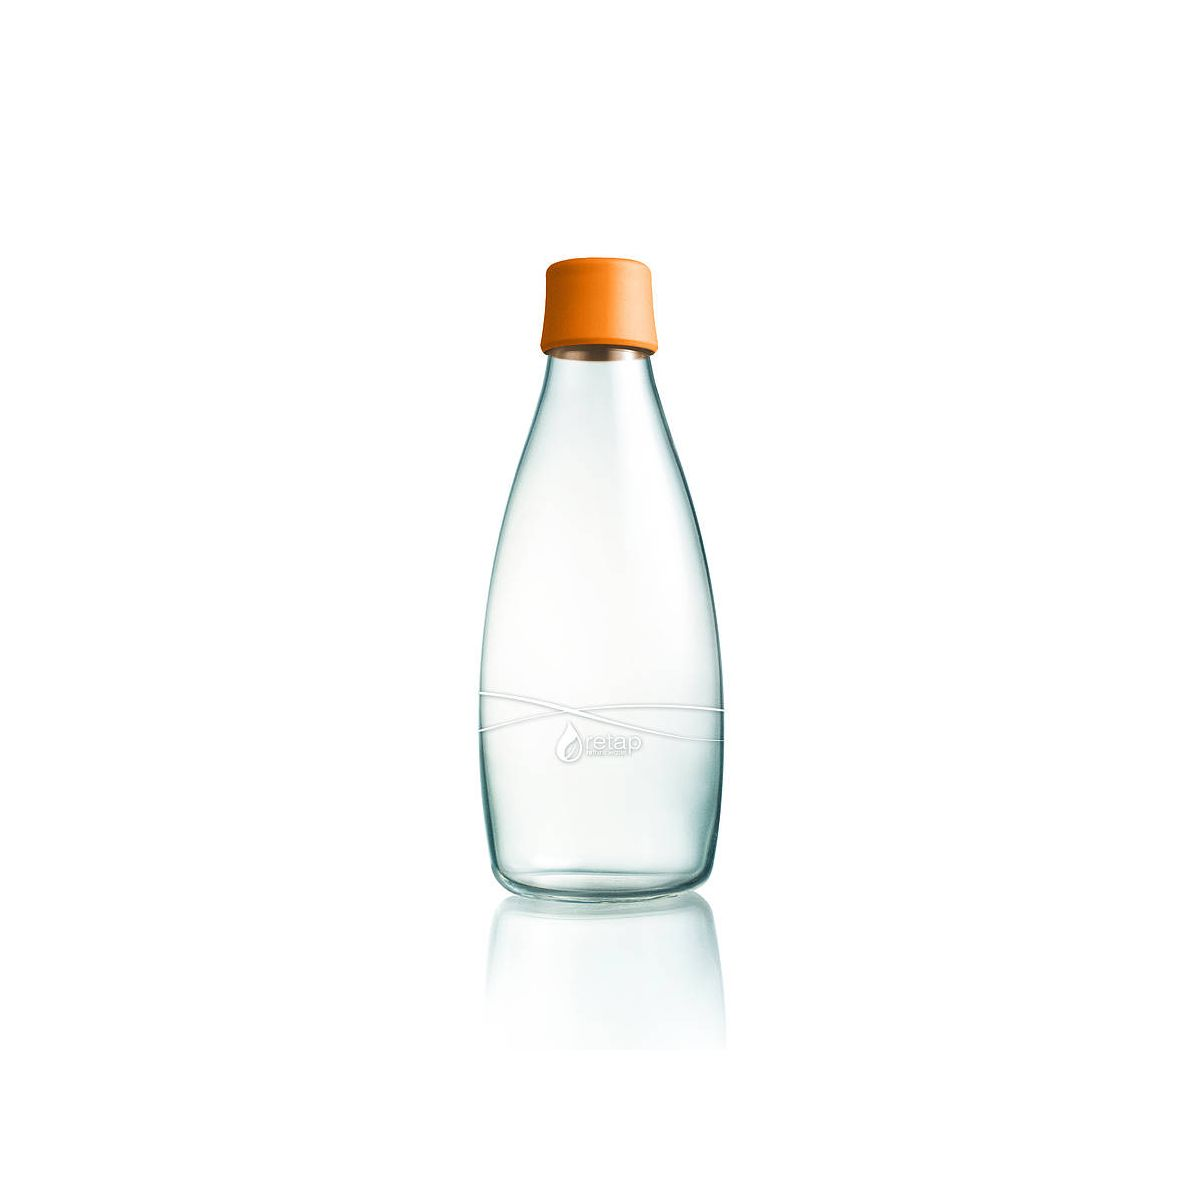 Bouteille en verre 0 8 l sebio - Bouteille en verre originale ...